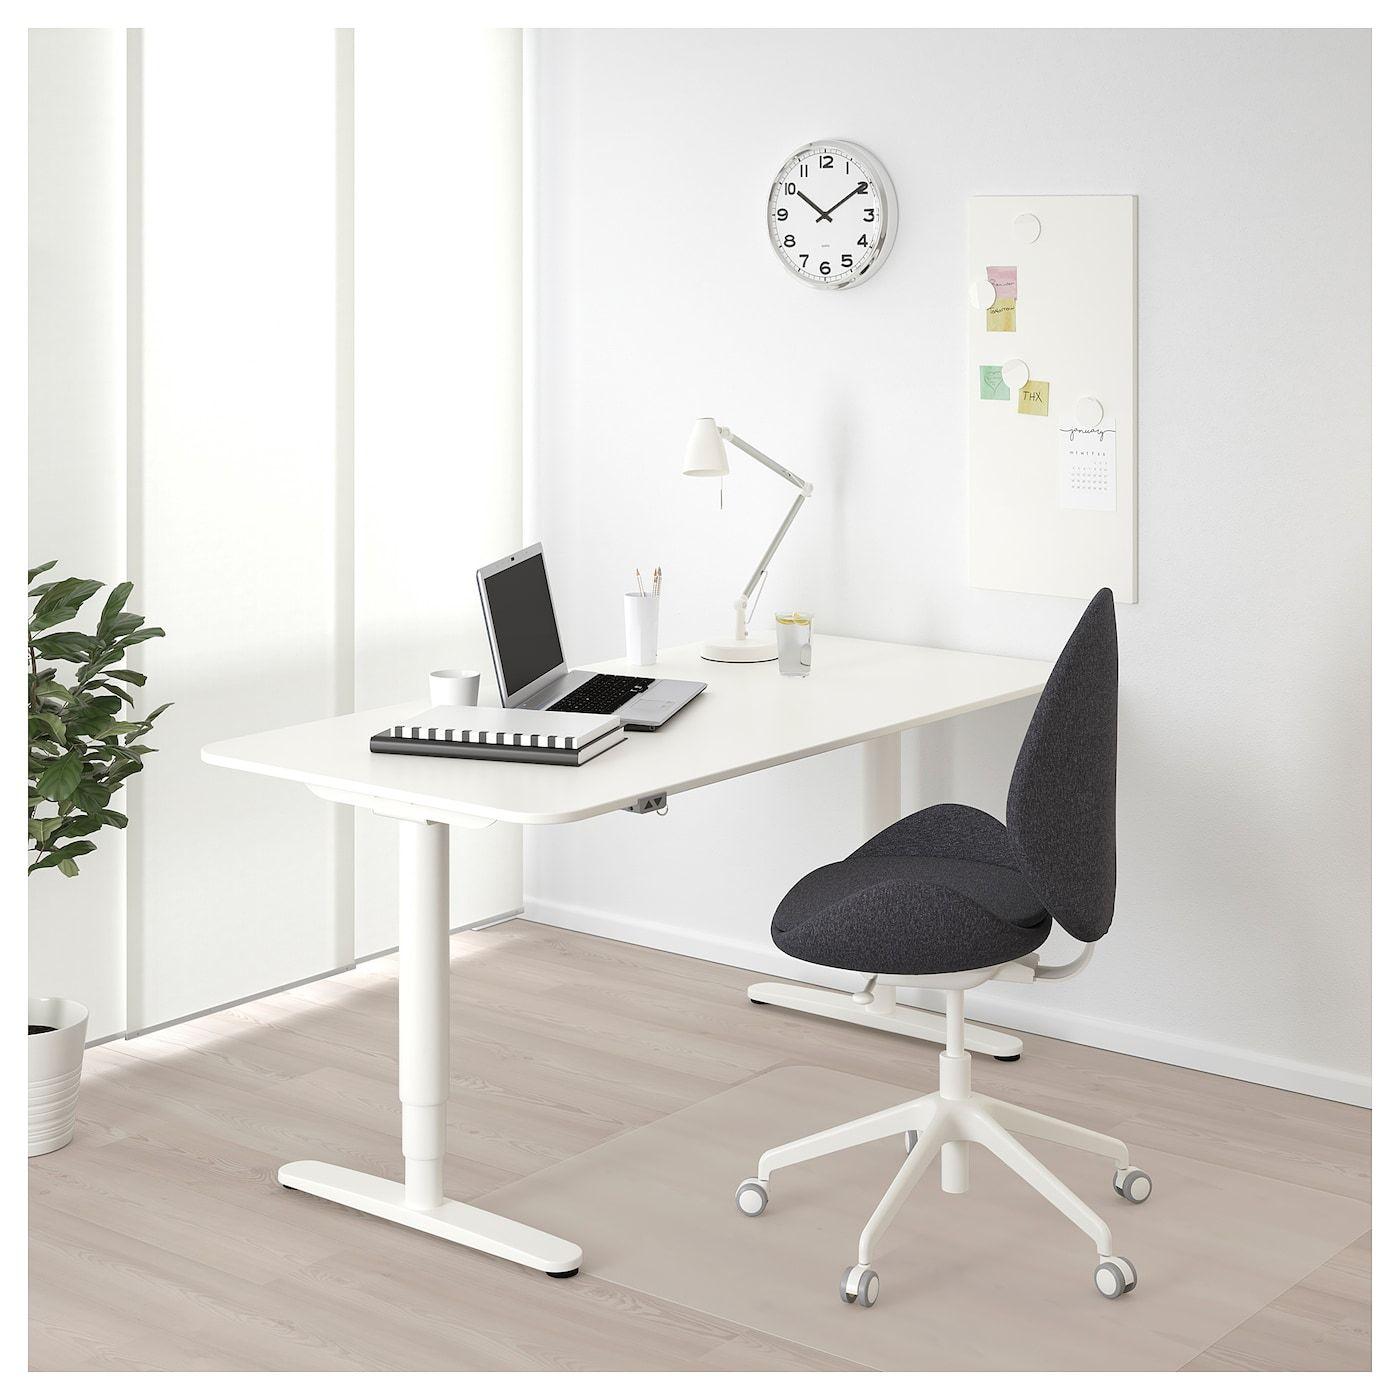 Bekant Desk Sit Stand White Ikea Solutions De Rangement Ikea Bureau Angle